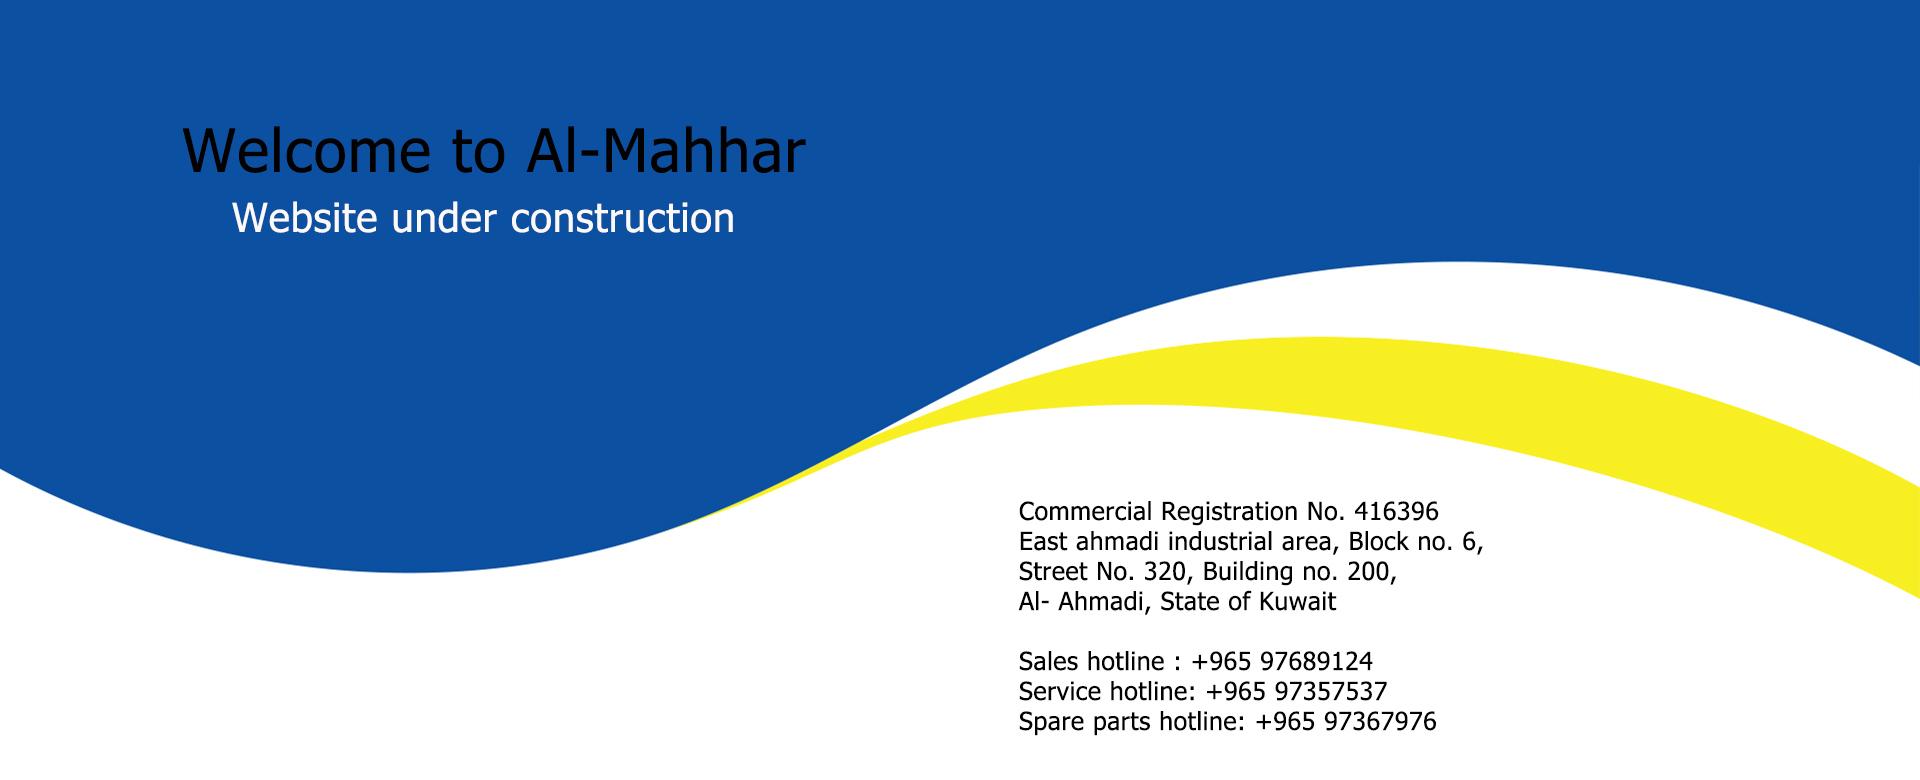 Al-Mahhar